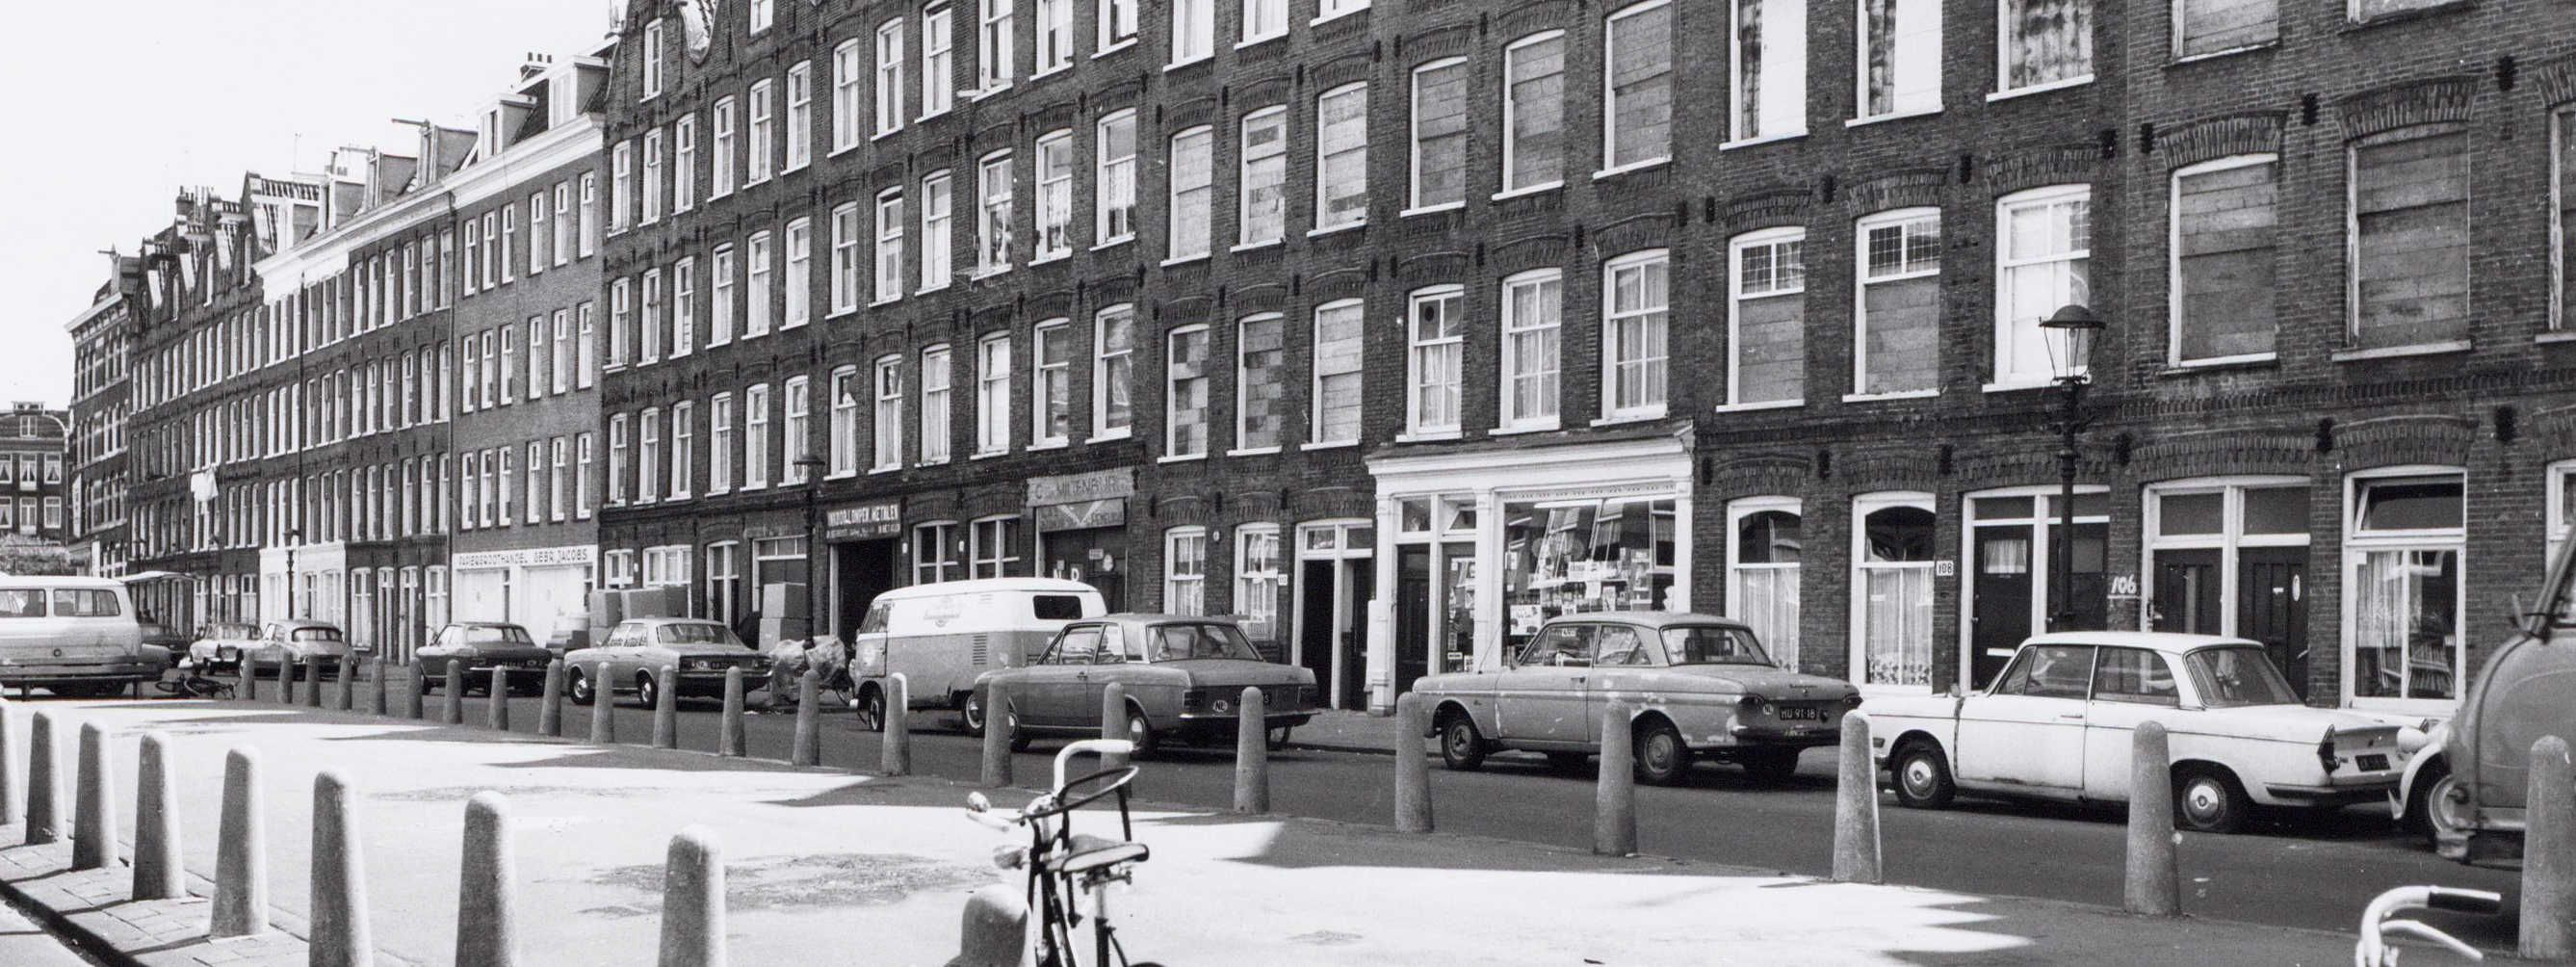 Wagenaarstraat 110 - 1971 .<br />Foto: Beeldbank Amsterdam